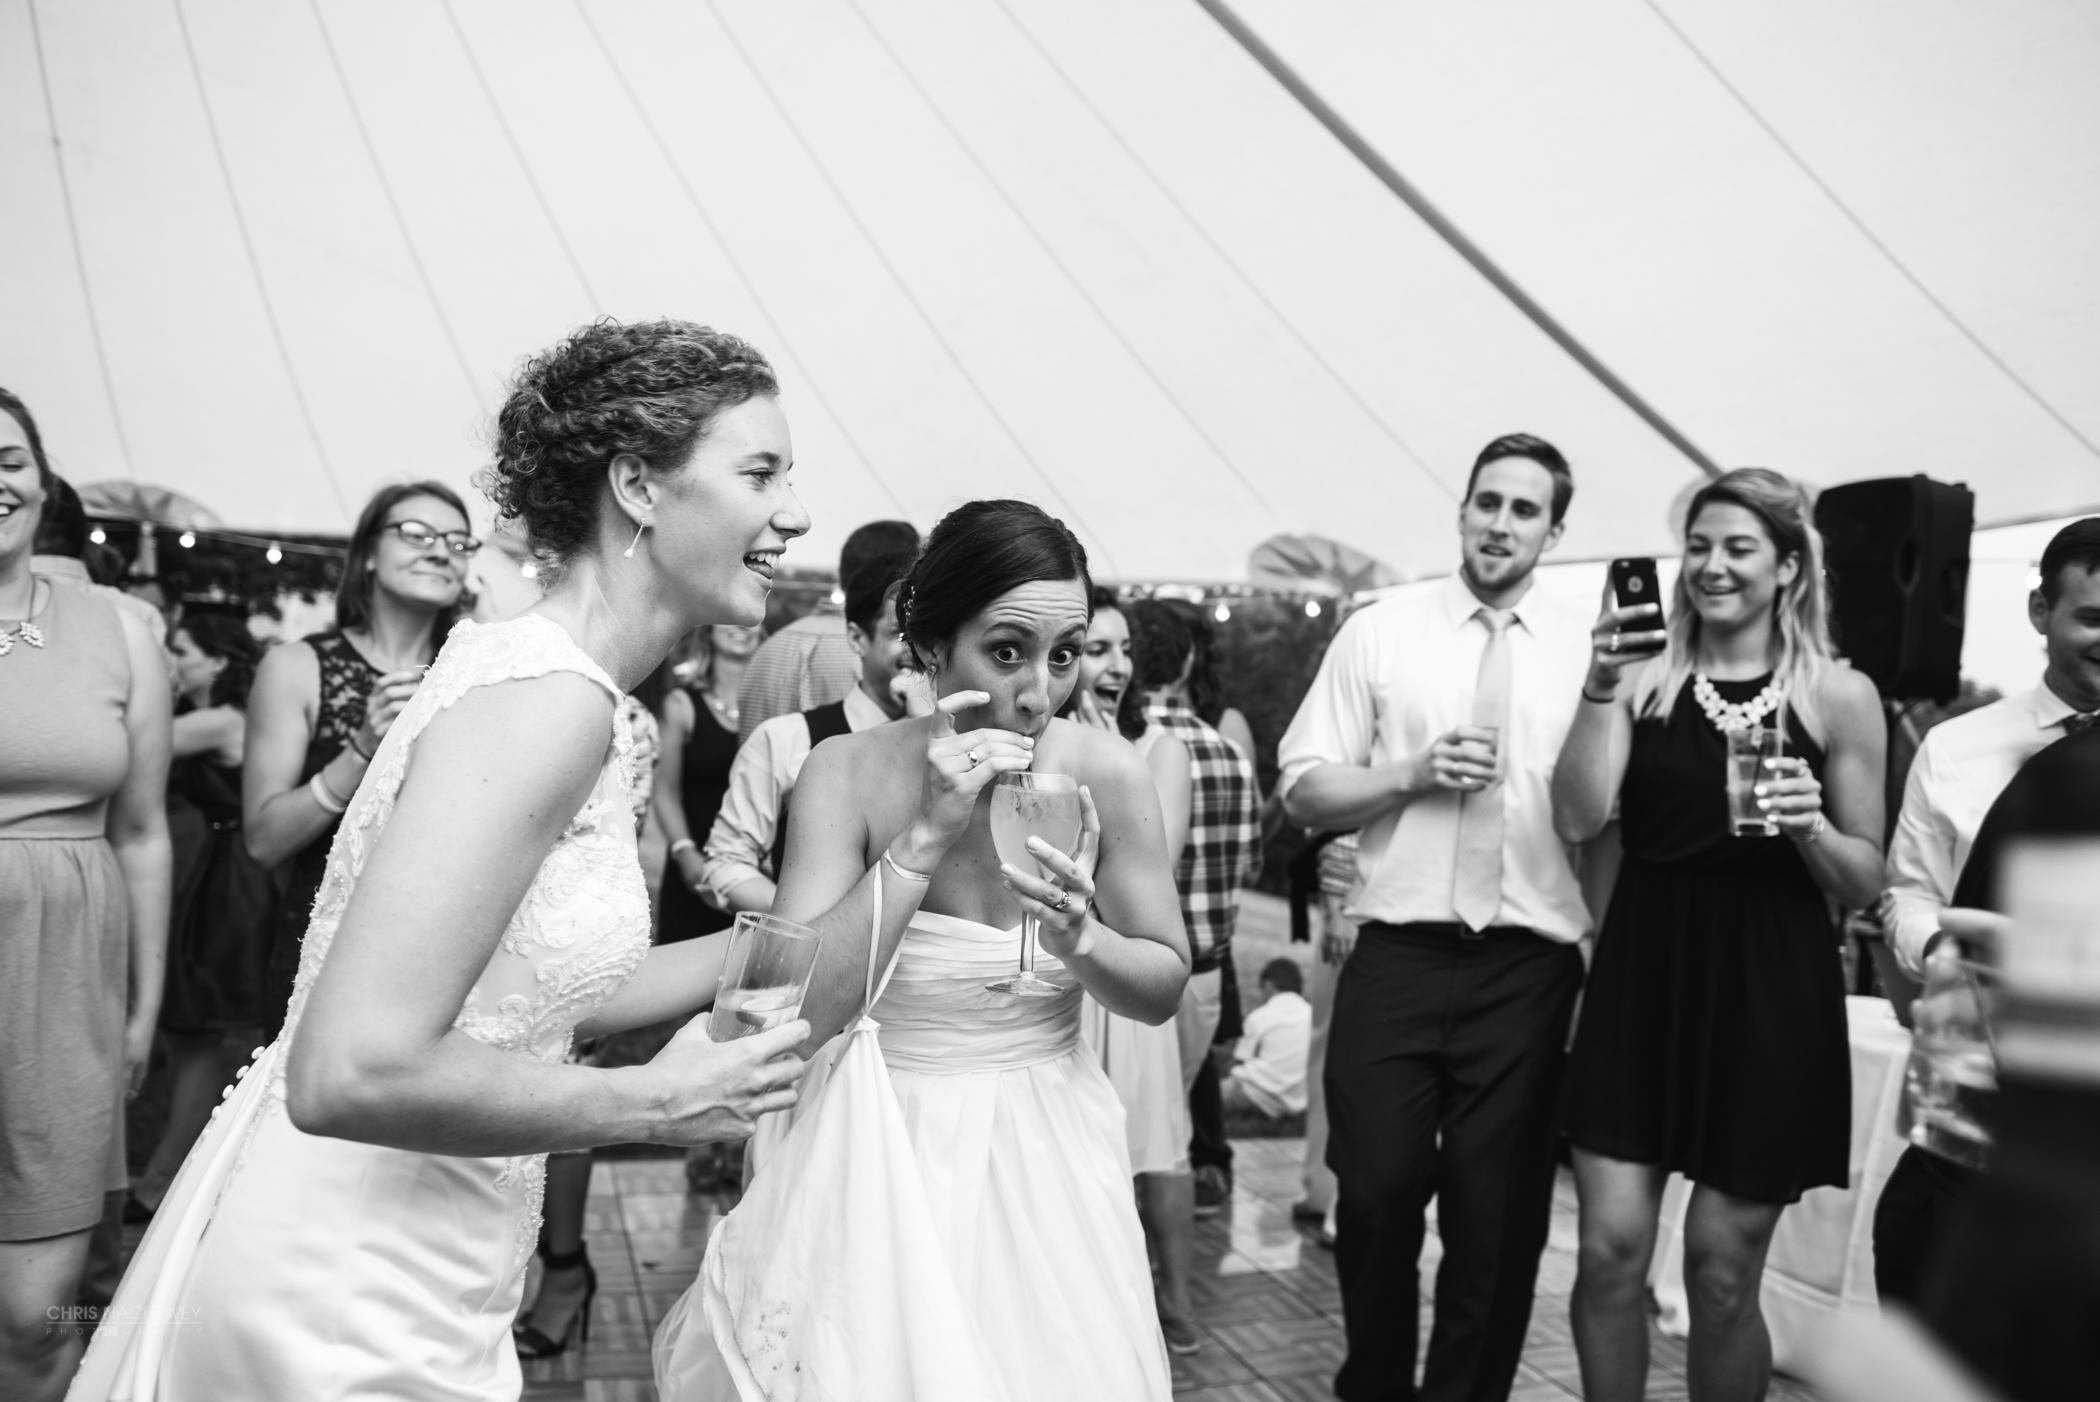 fun-wedding-photographers-connecticut-chris-nachtwey.jpg